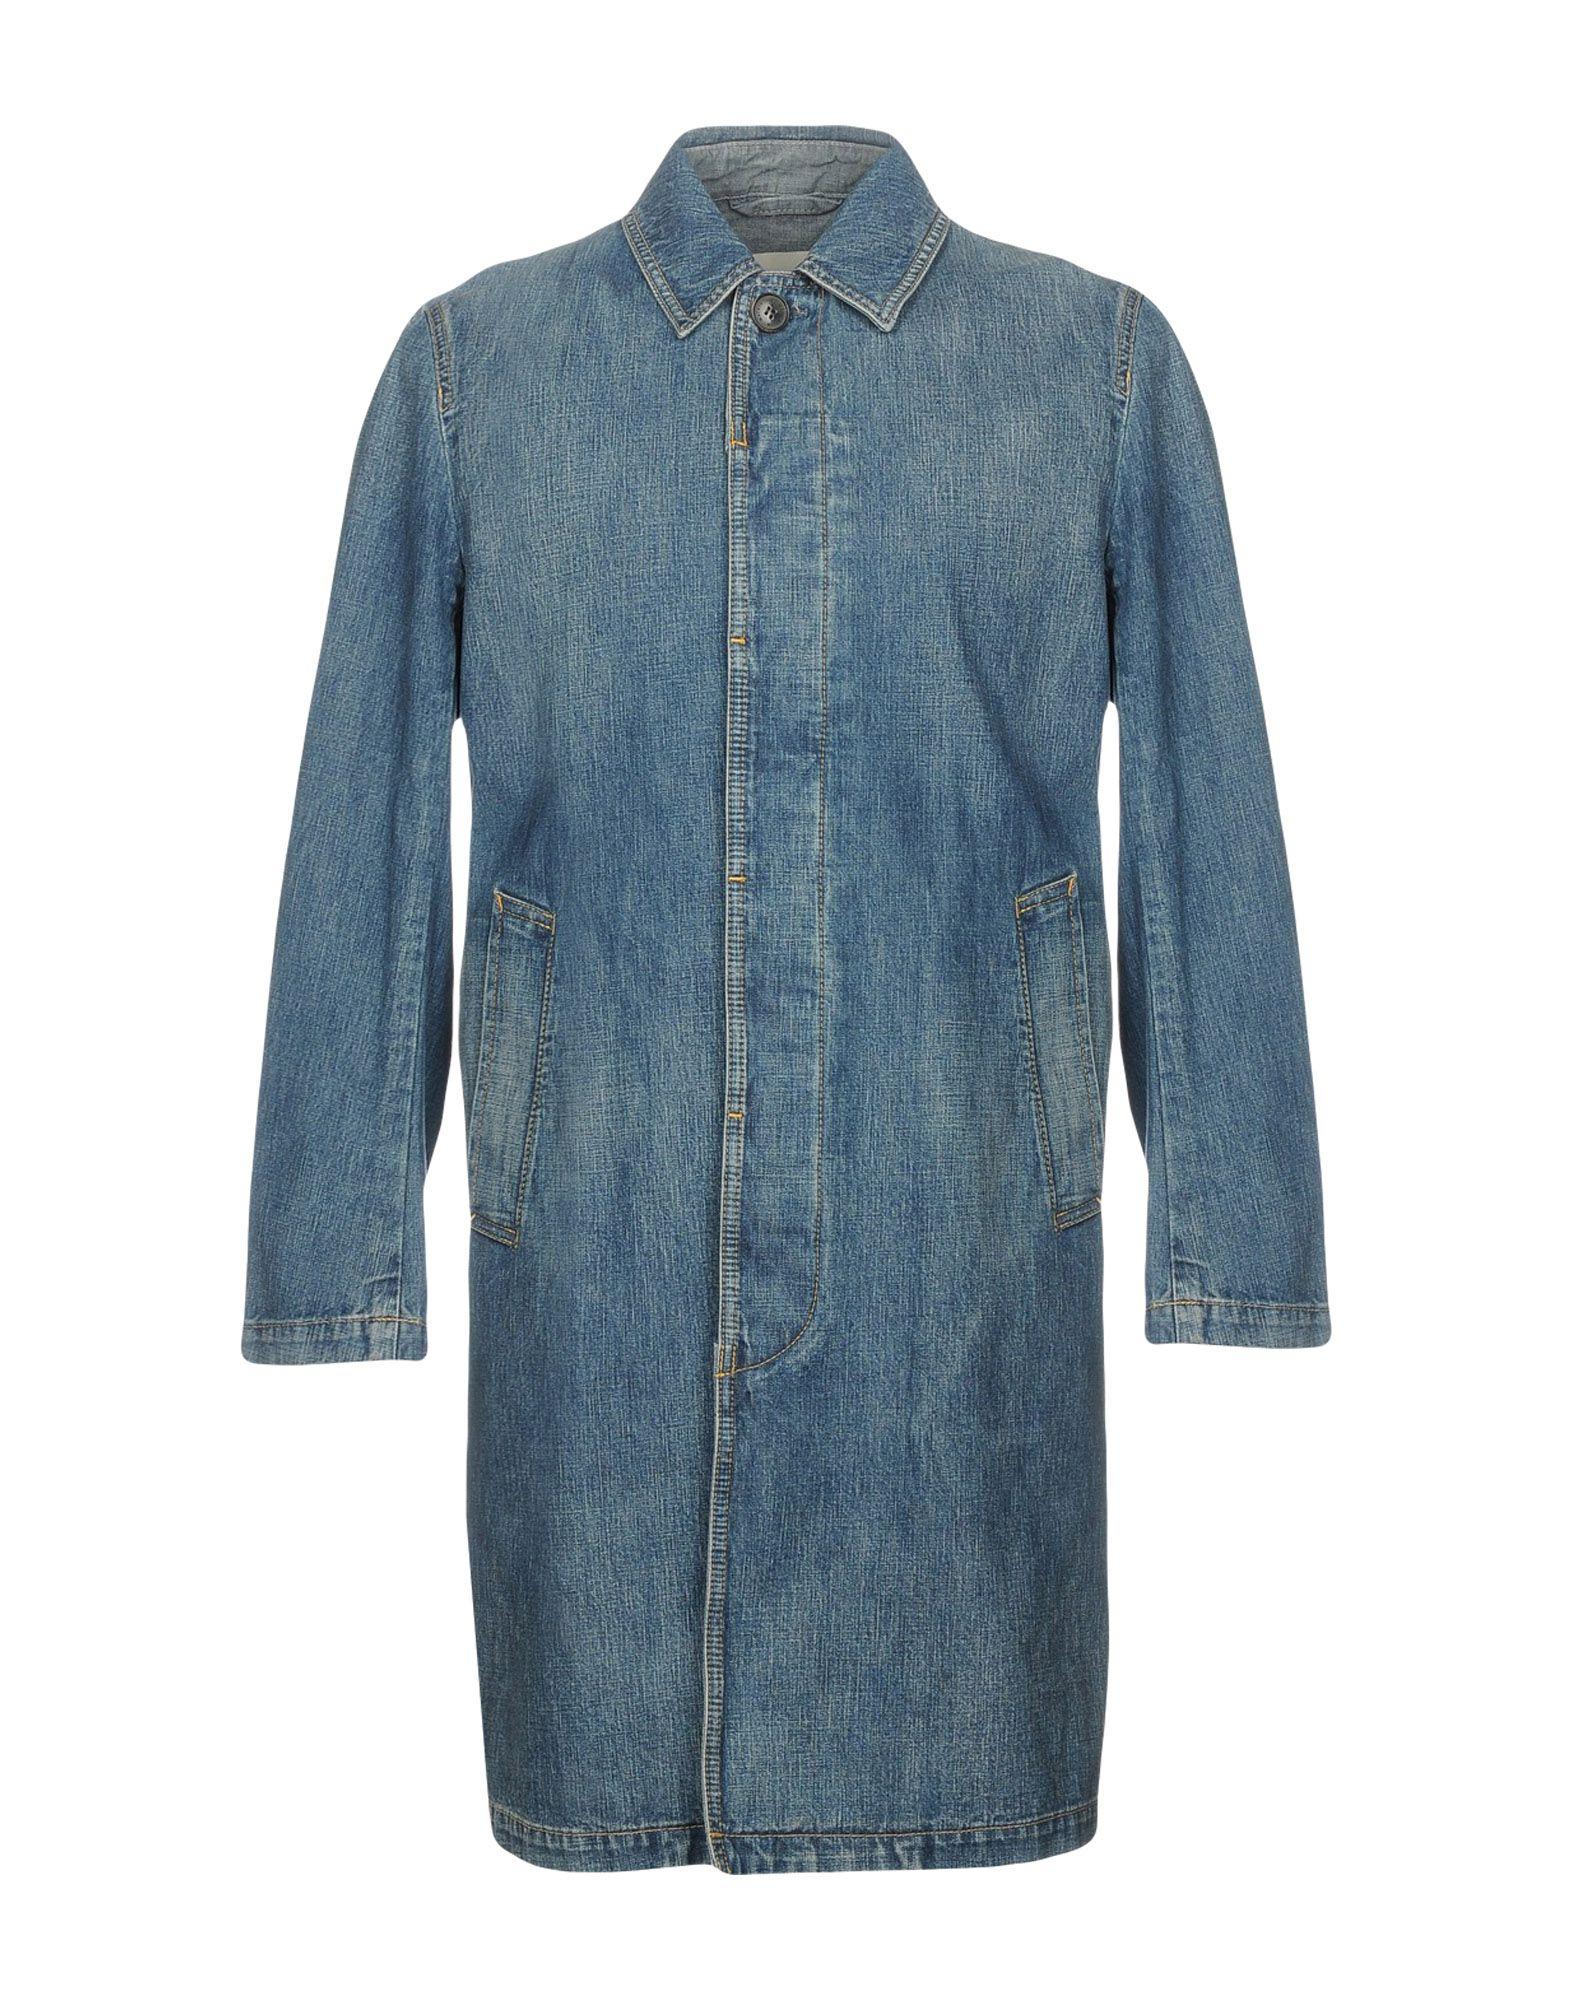 Giubbotto Jeans Mackintosh Uomo - Acquista online su